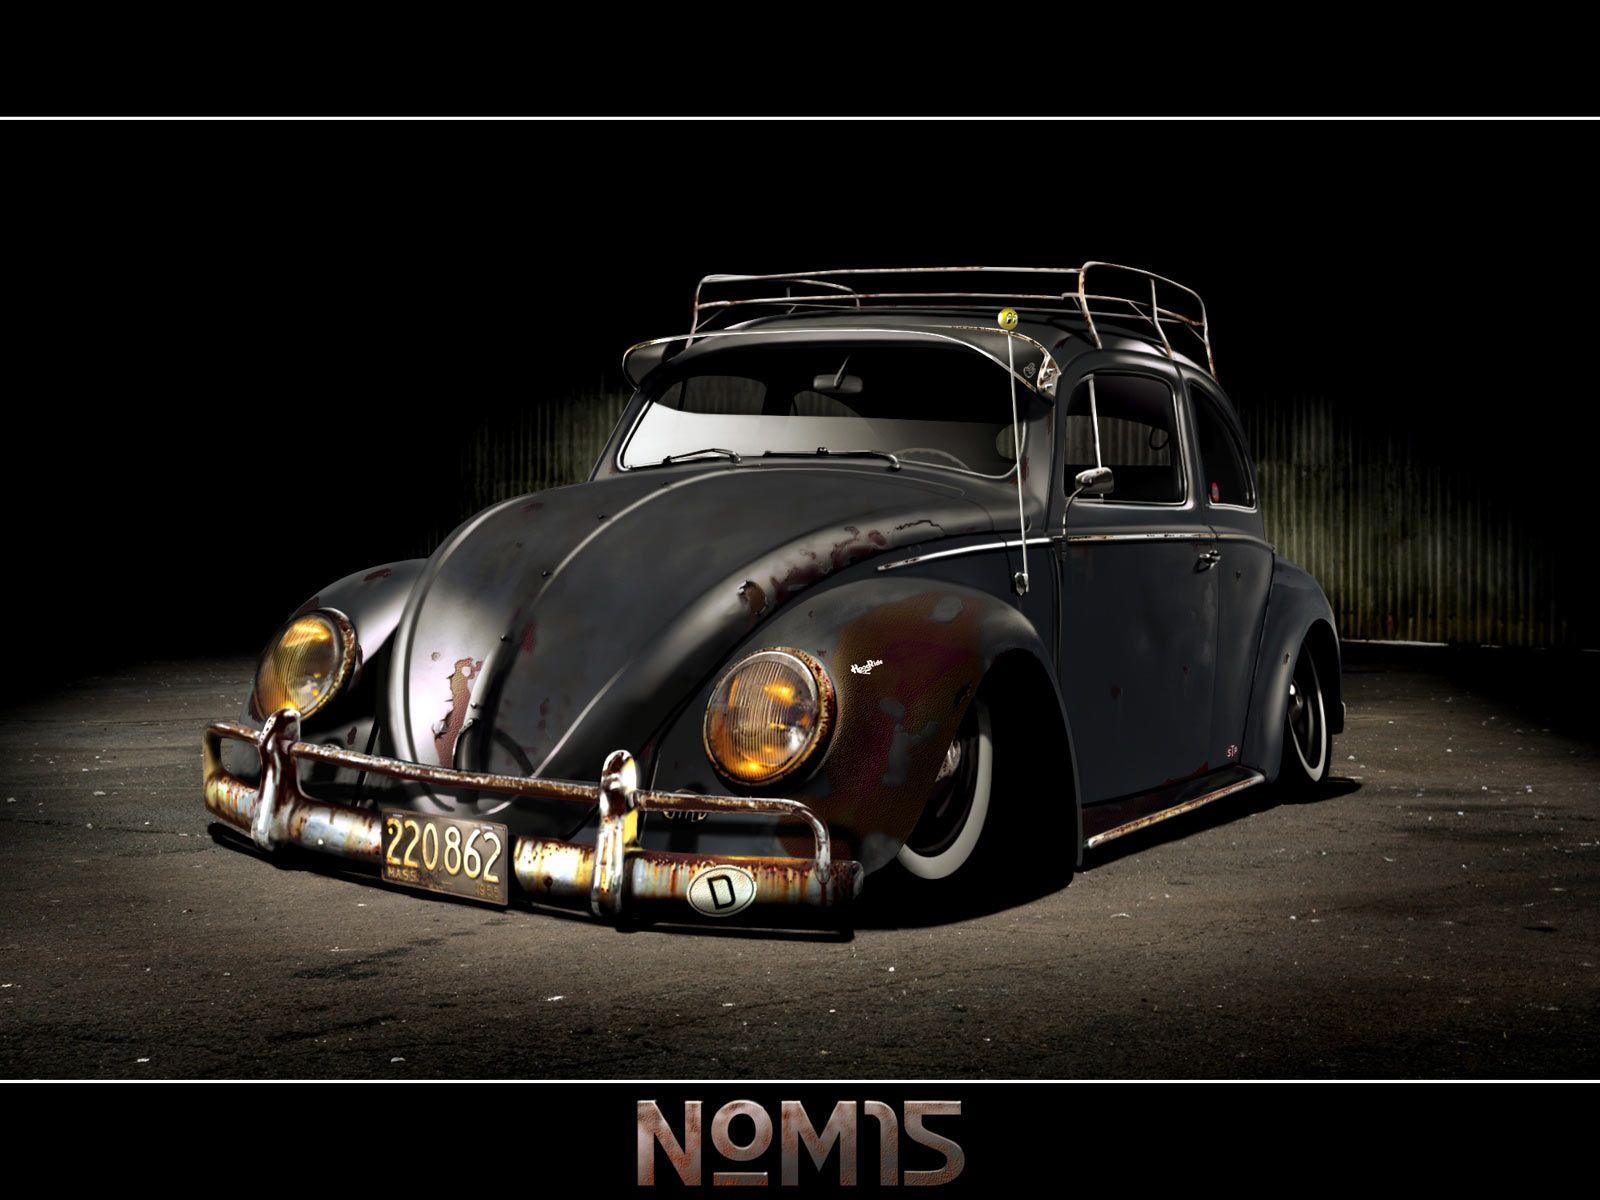 free pictures of old cars old car wallpaper for desktop cars rh pinterest com